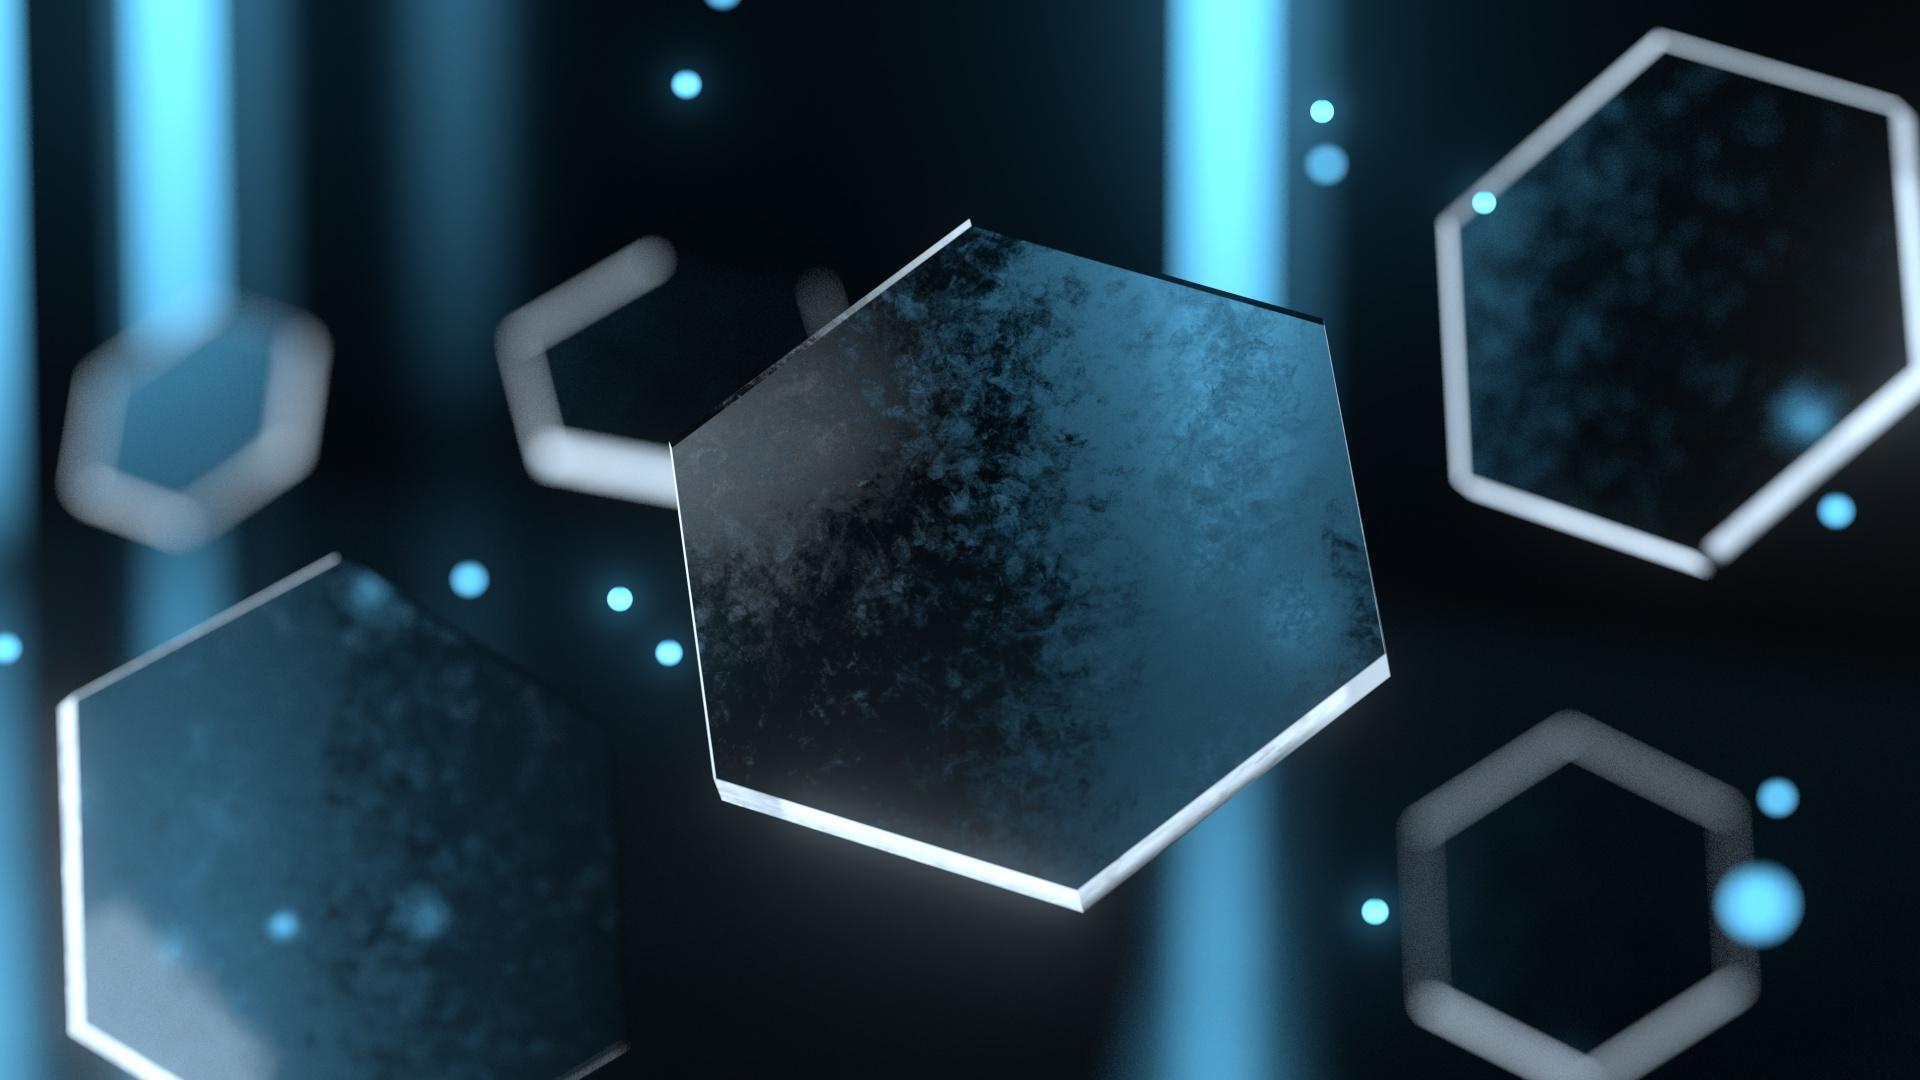 honeycomb-v001.jpg